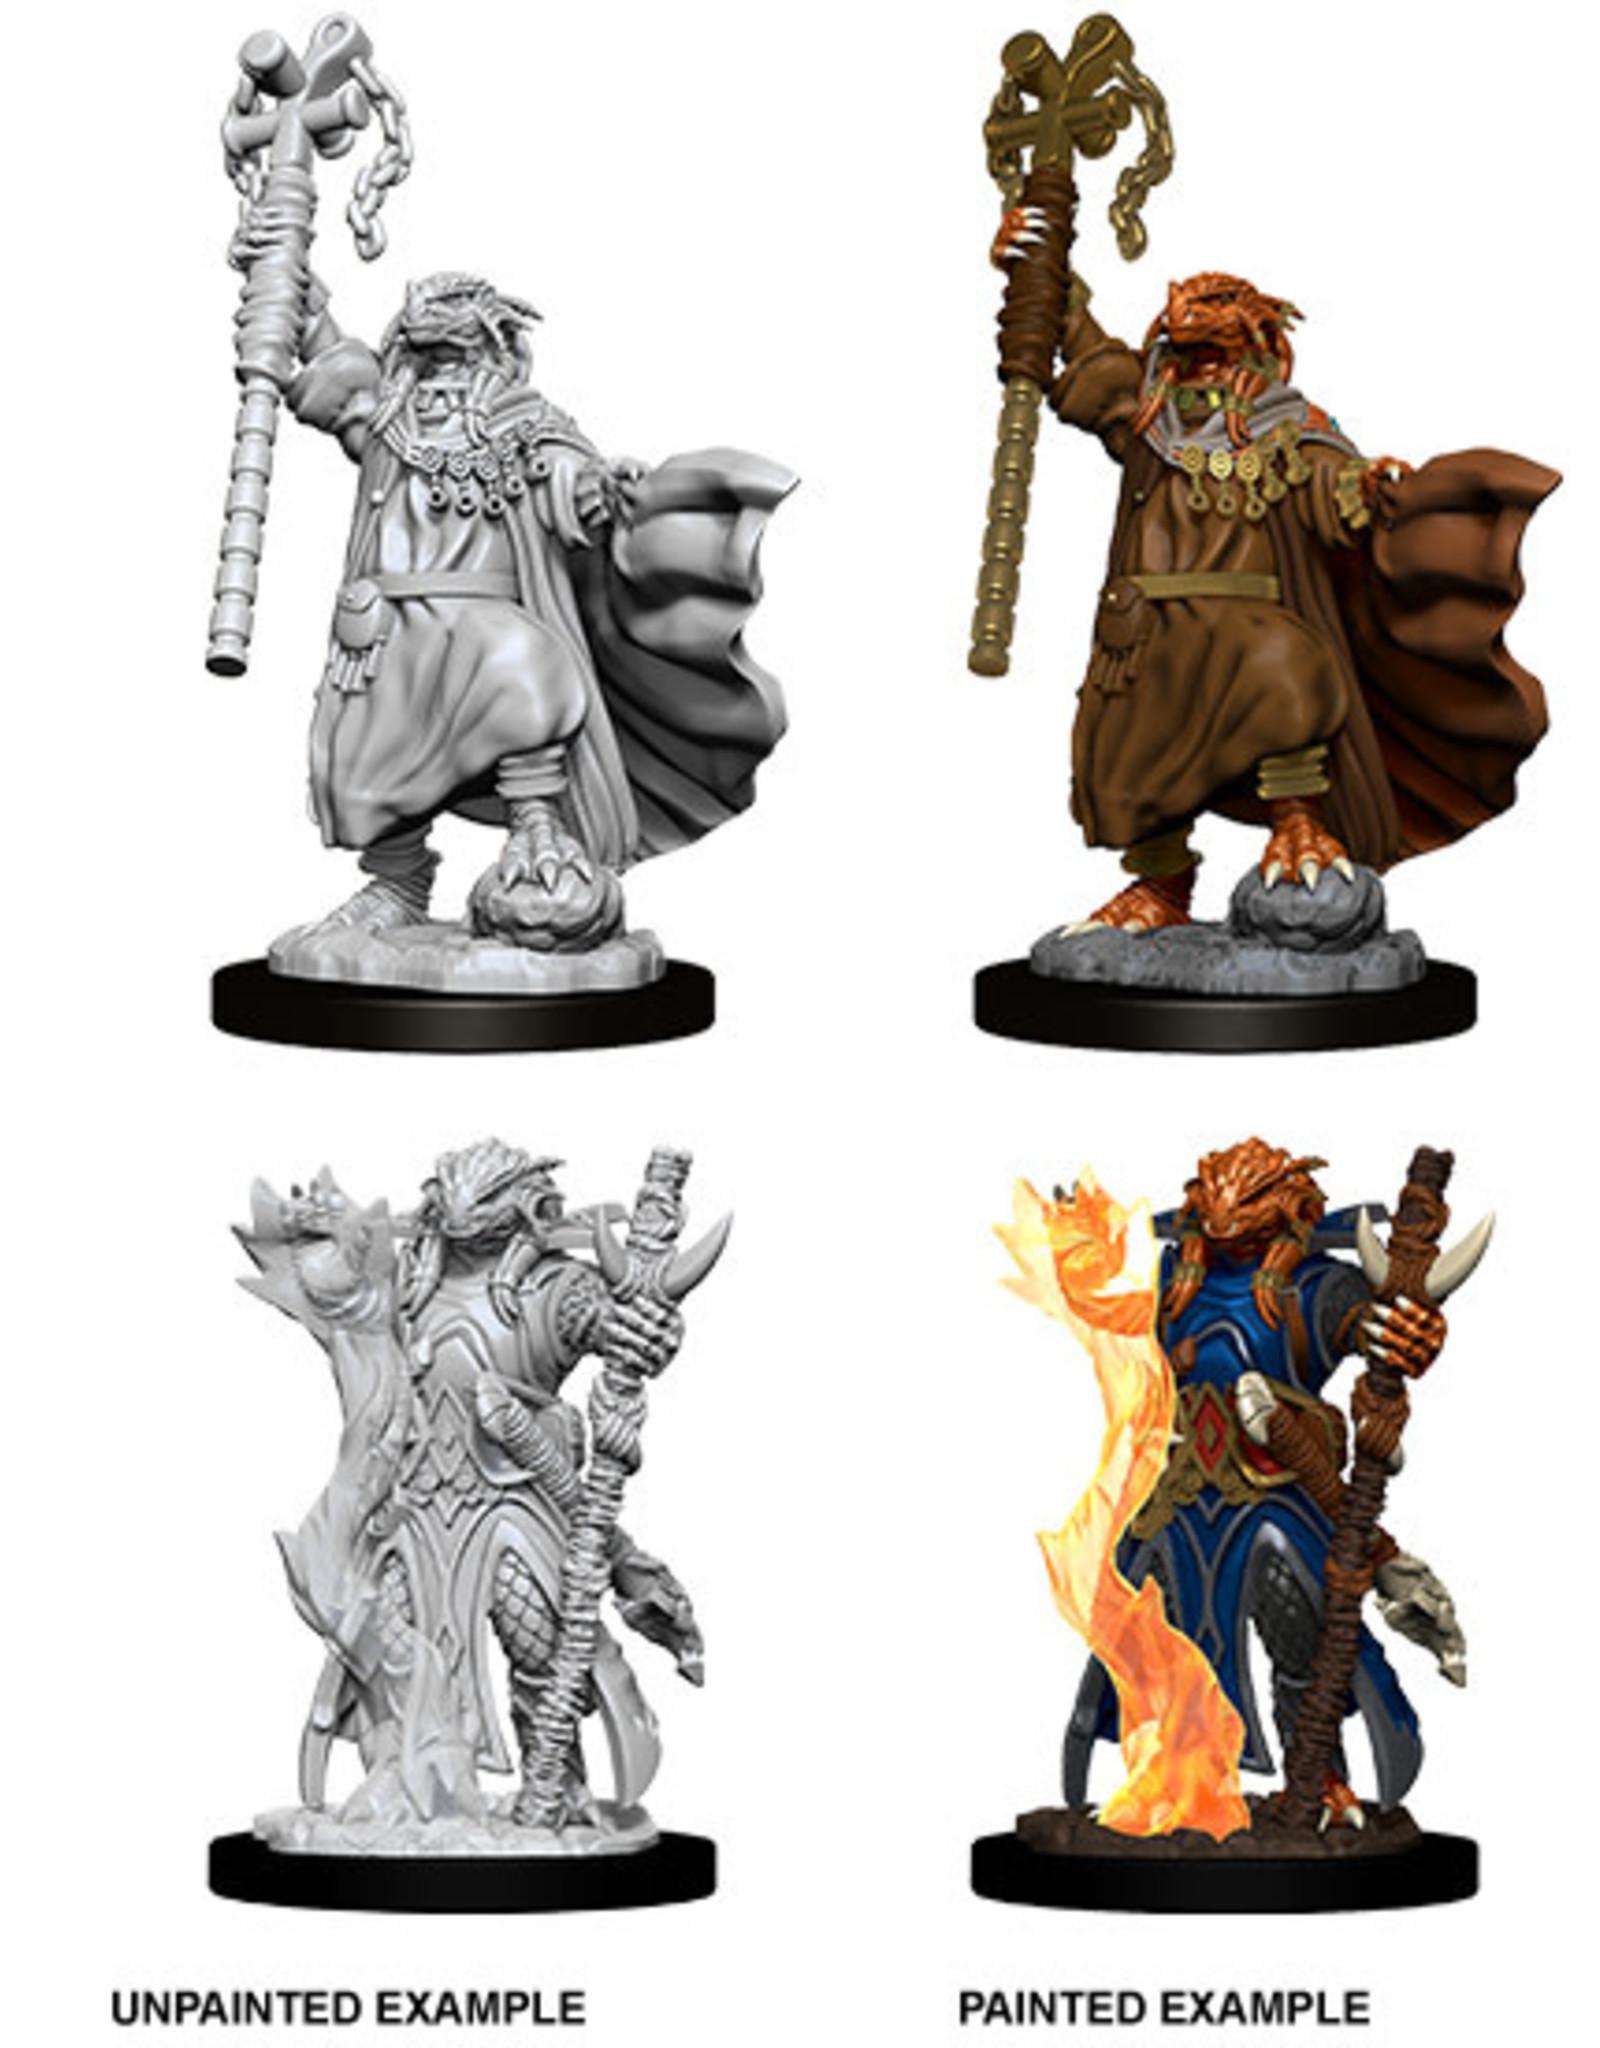 WizKids Dungeons & Dragons Nolzur's Marvelous Miniatures: Dragonborn Female Sorcerer